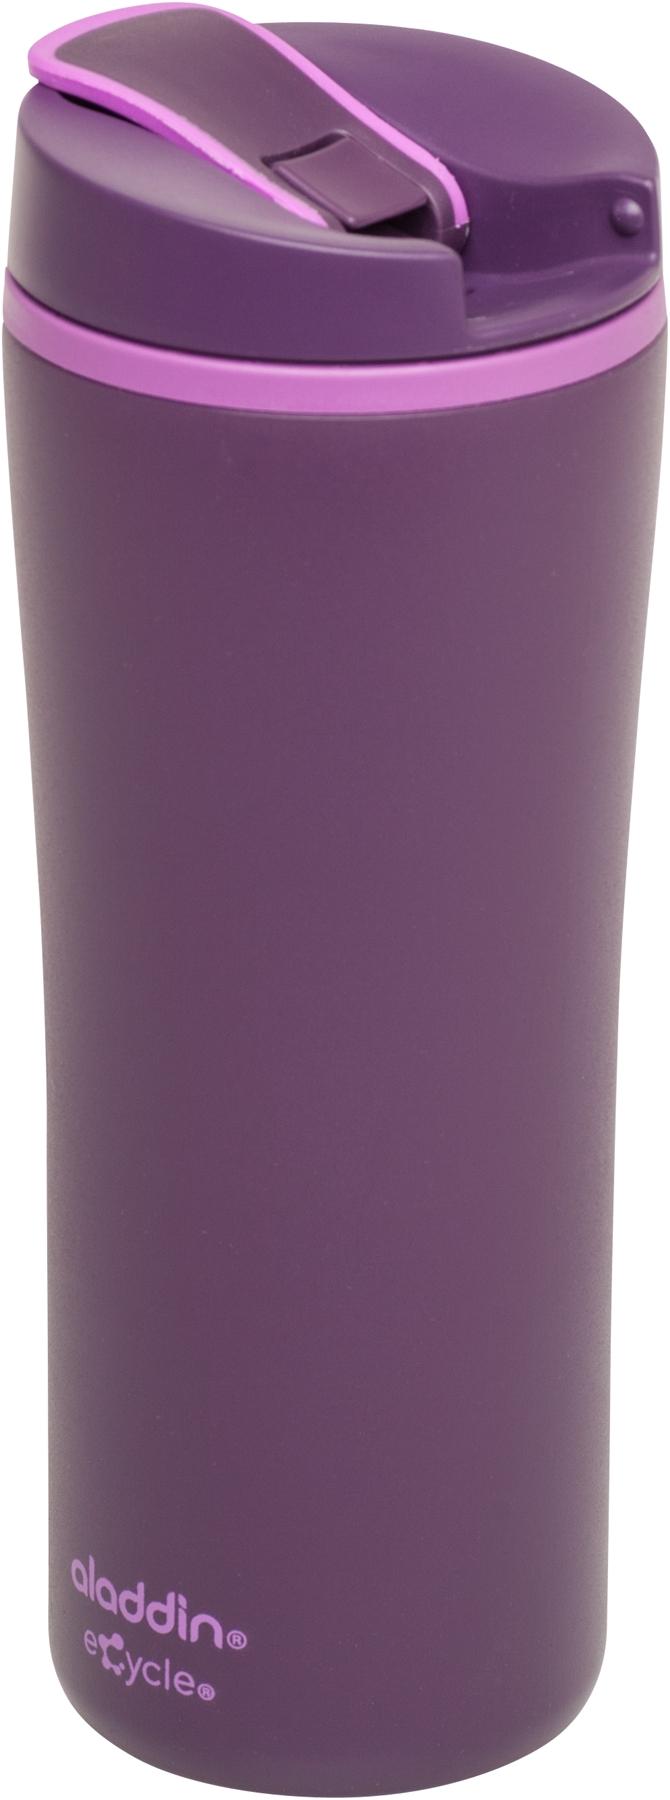 Termohrnek aladdin Flip-Seal fialový